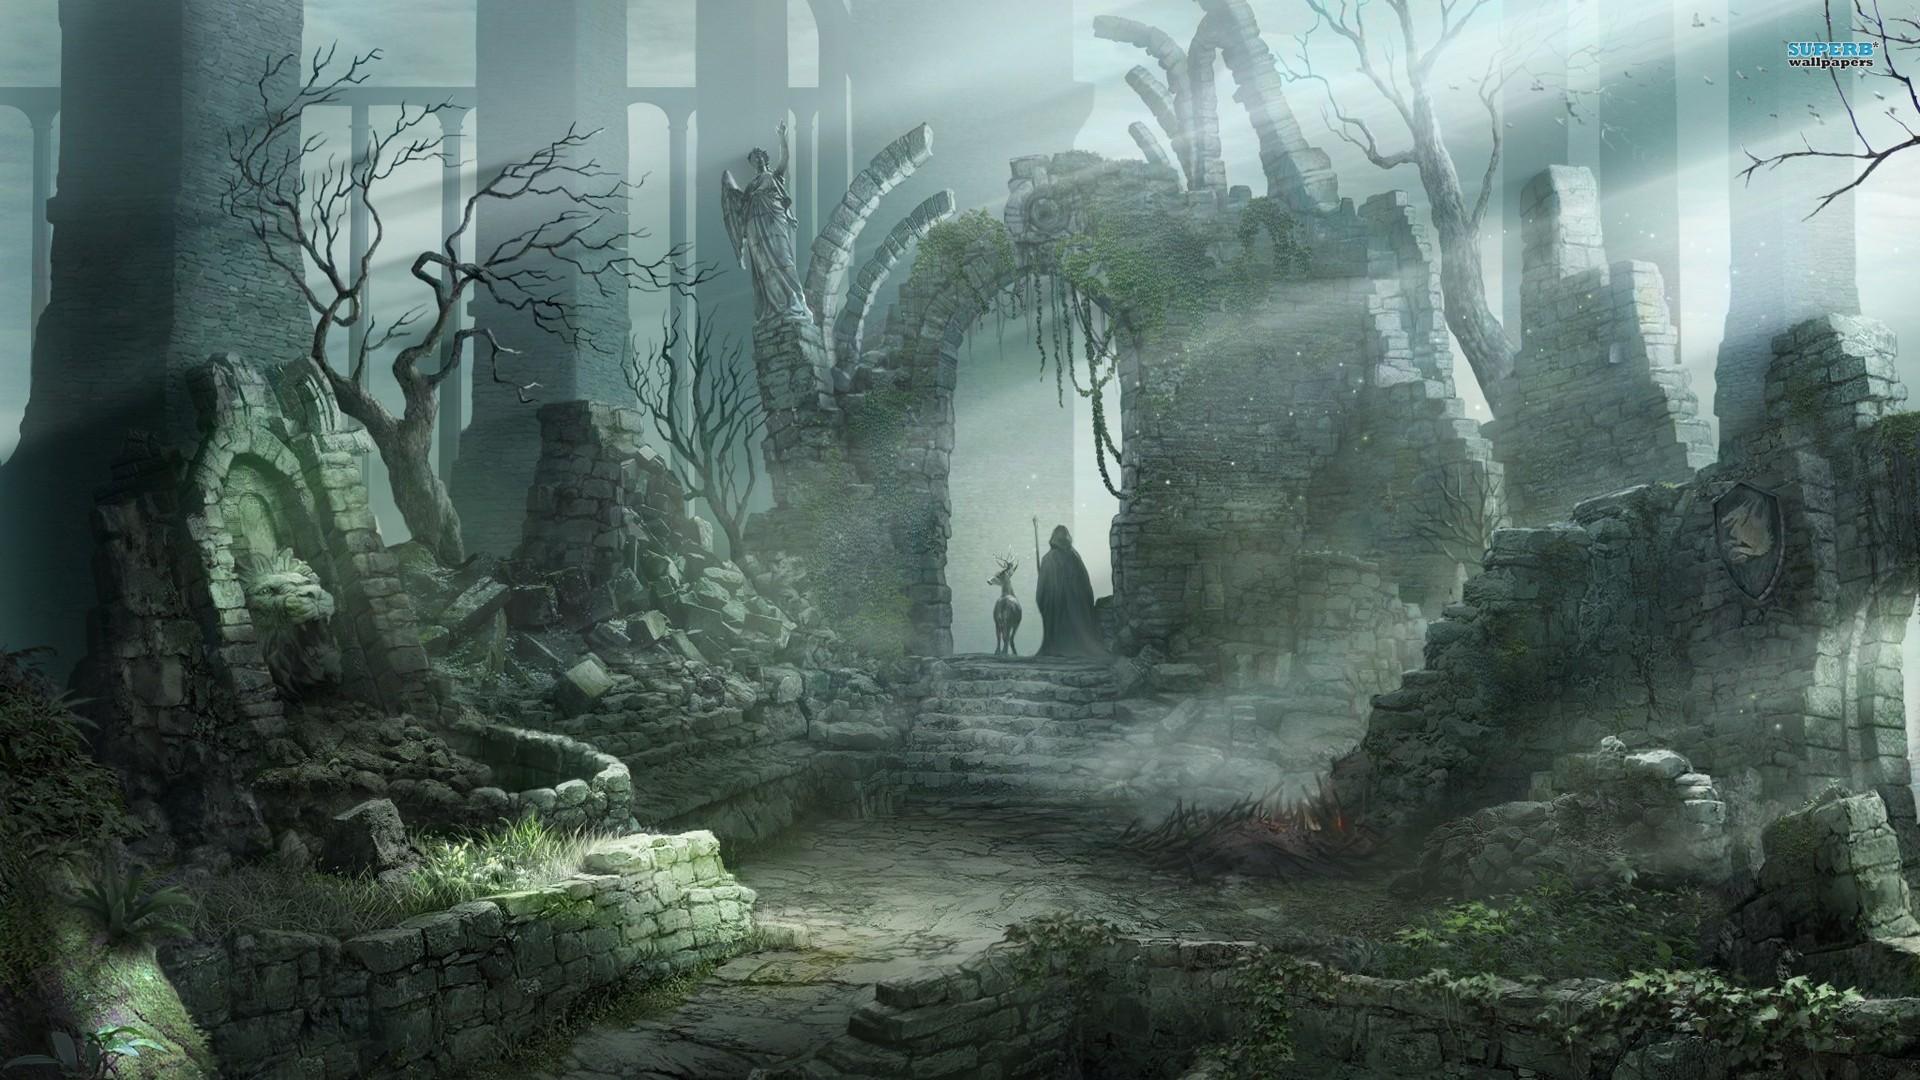 Dark Souls Background 1920x1080: Dark Souls Backgrounds (64+ Images